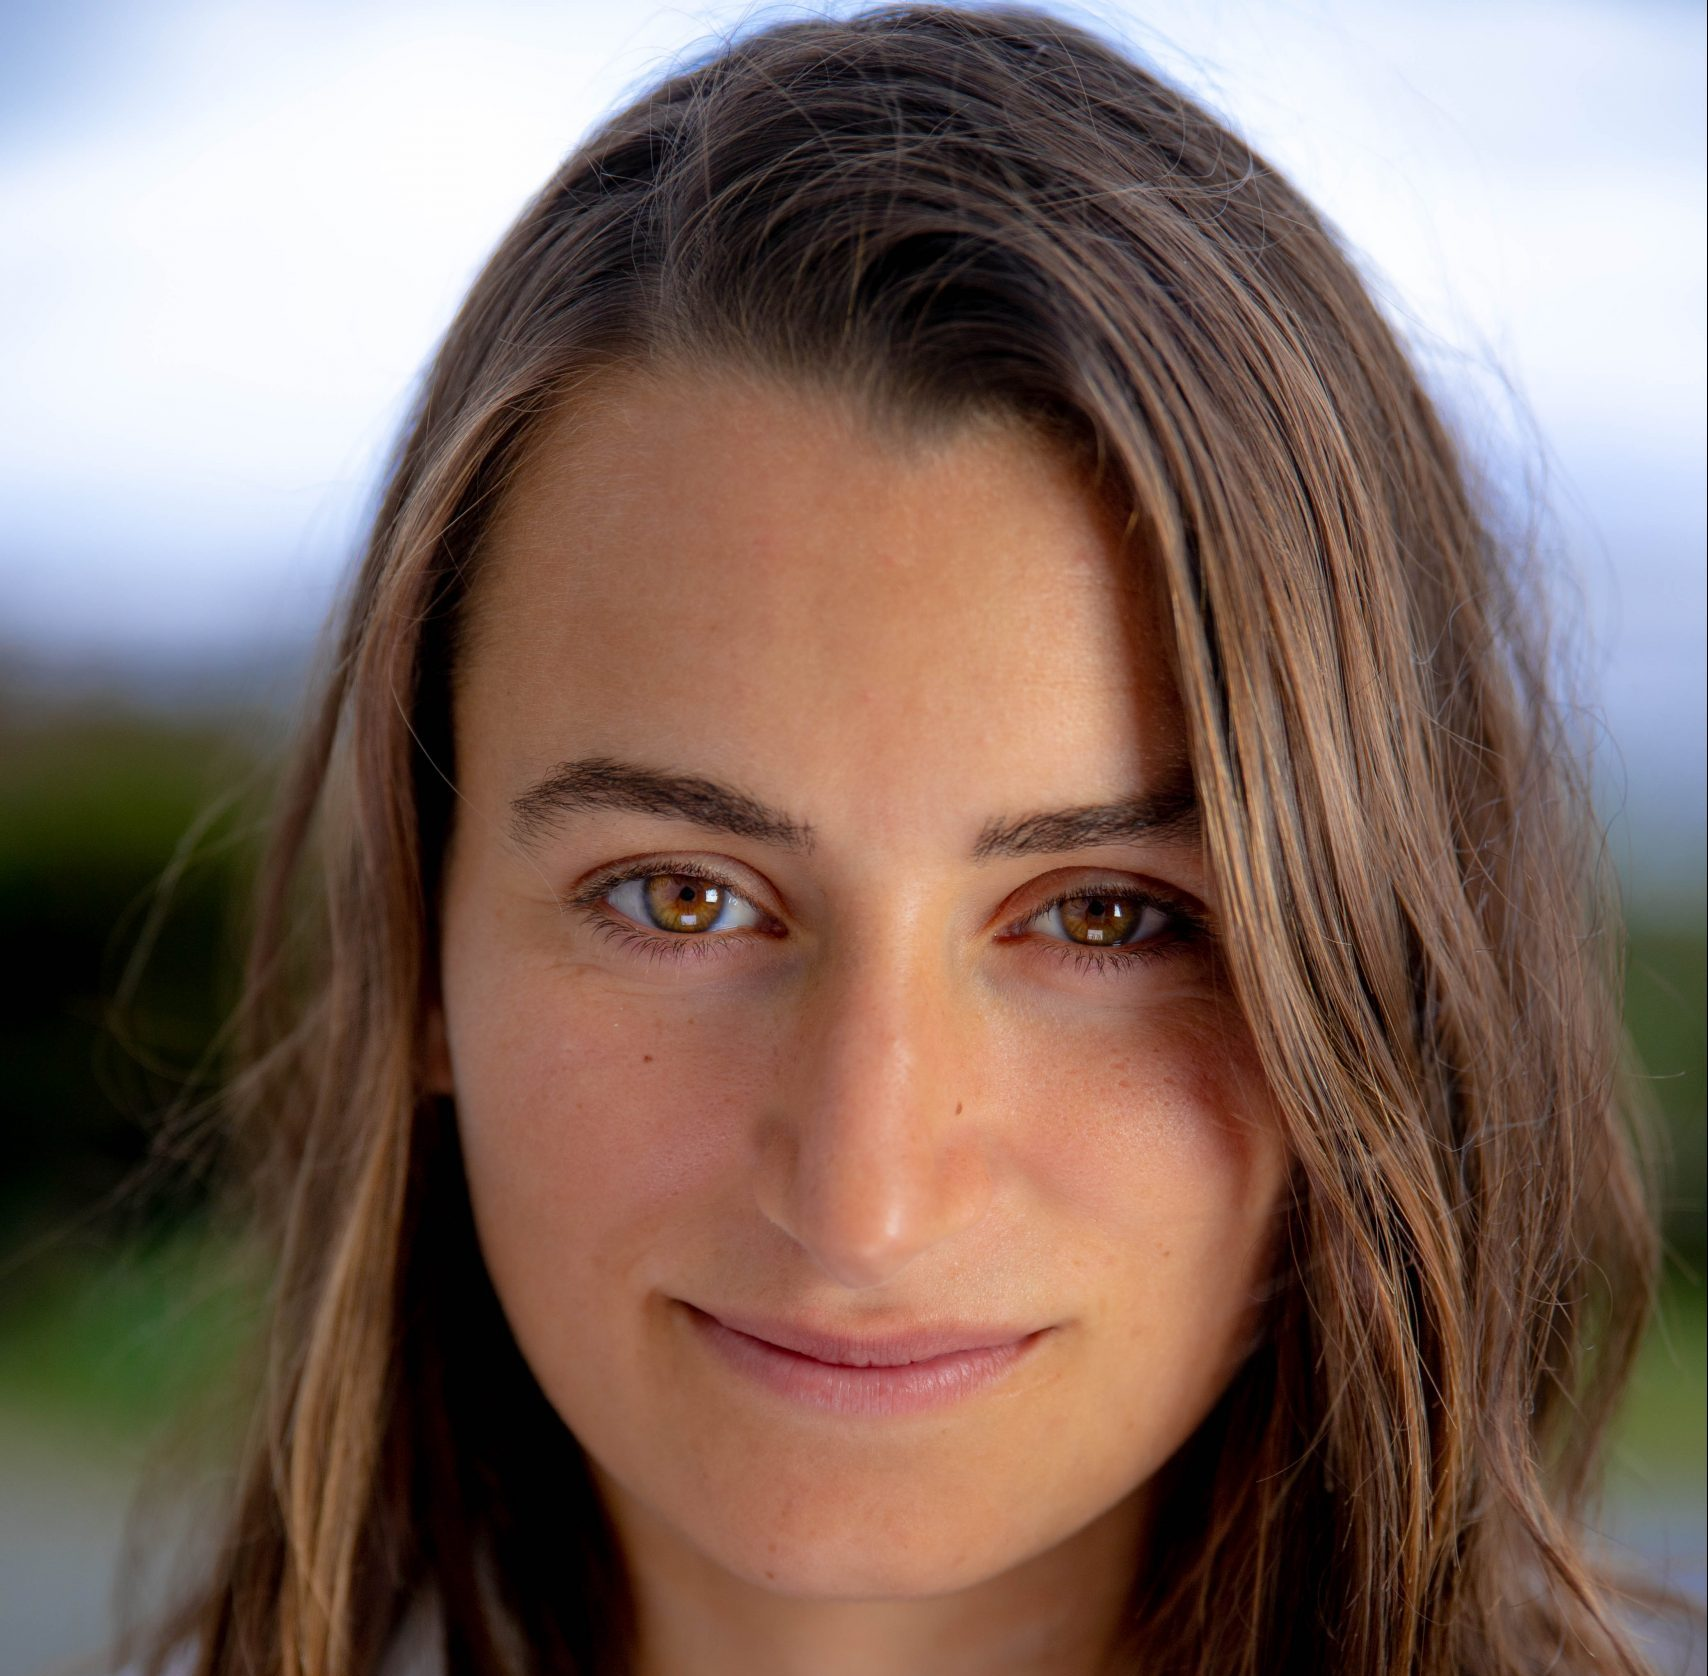 Dr. Jennifer Attard